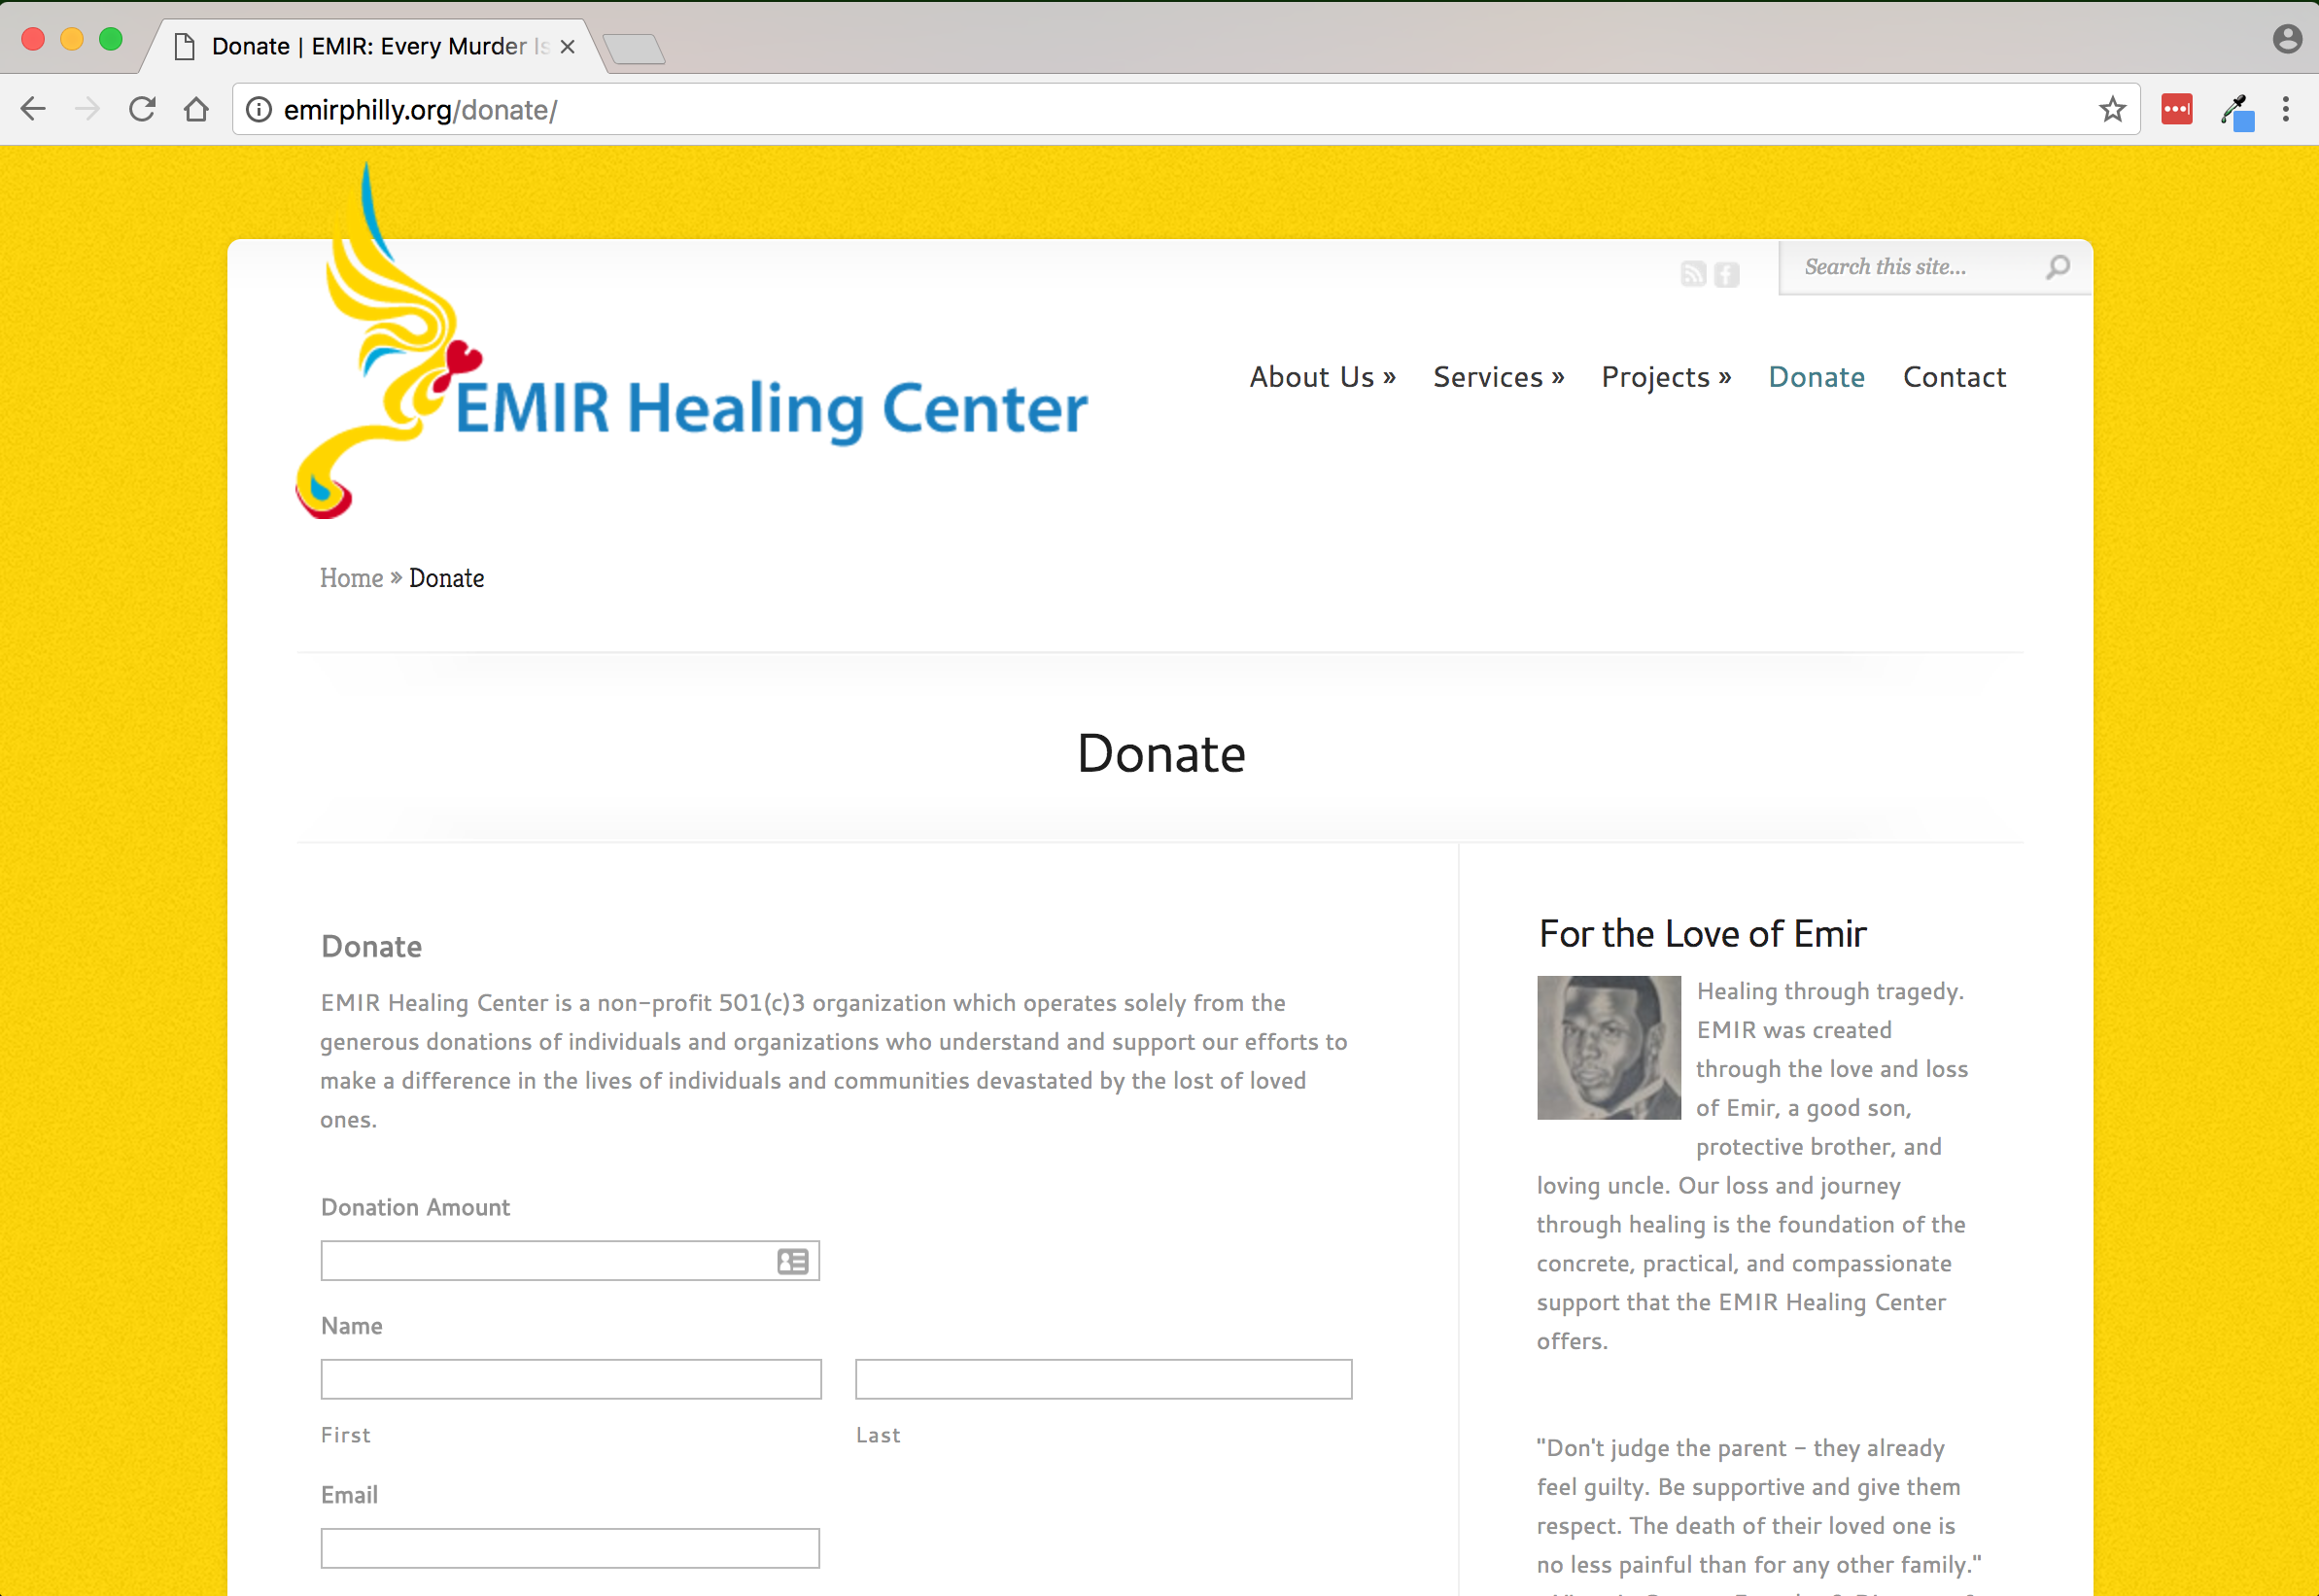 EMIR Healing Center Donate page